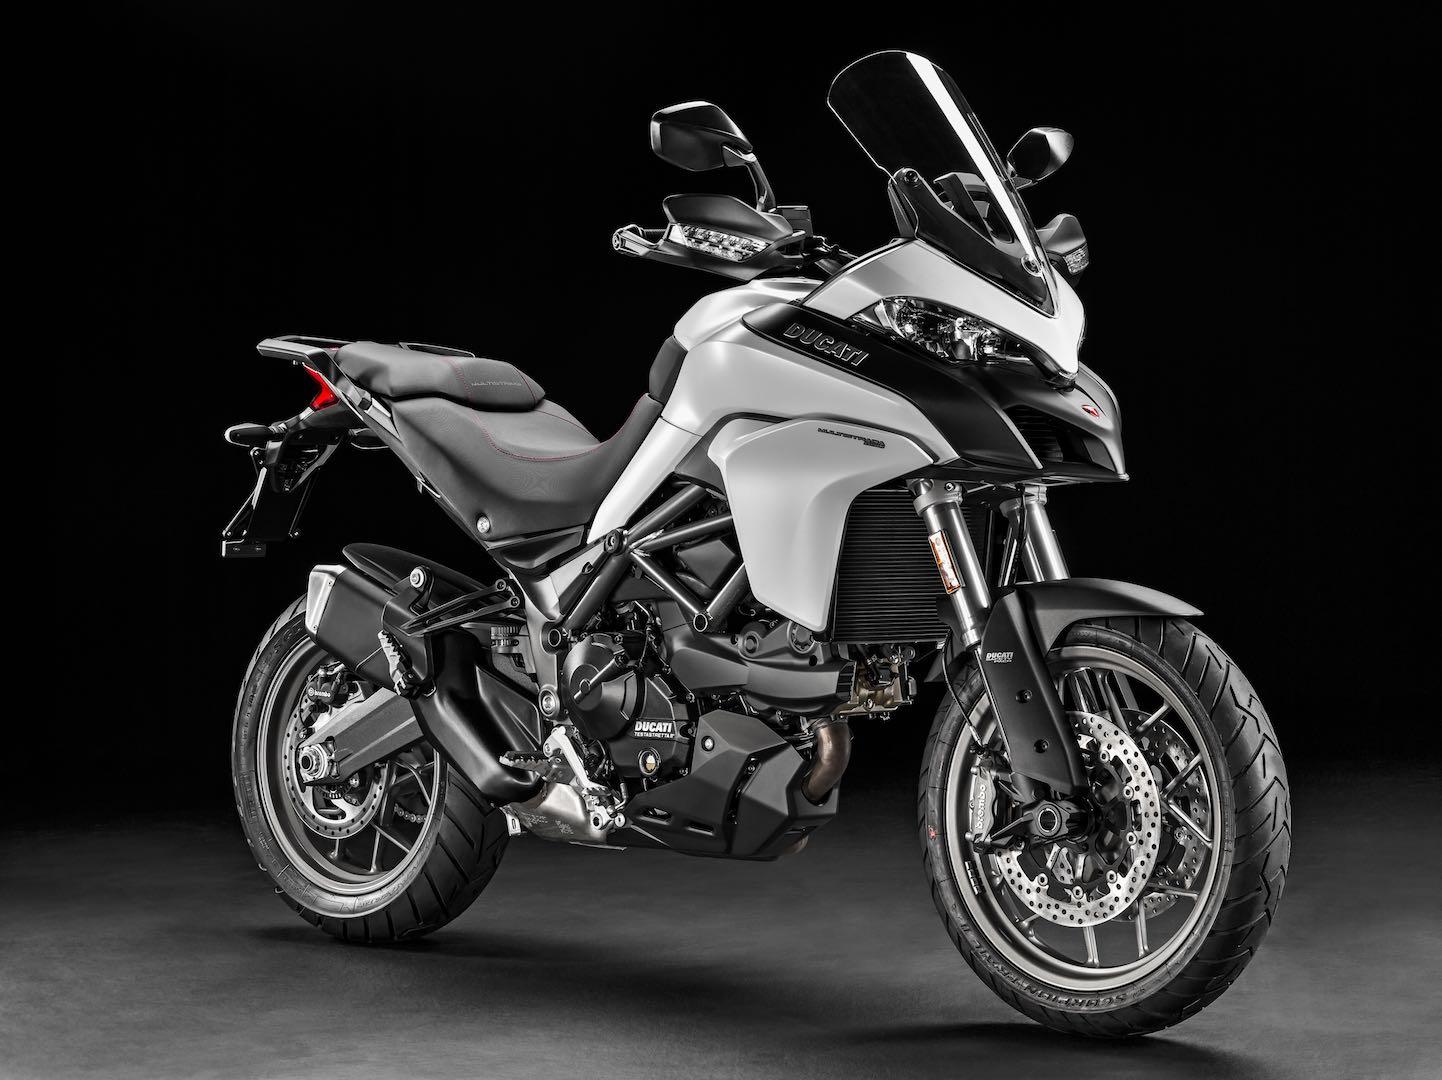 Ducati Multistrada Skyhook Suspension